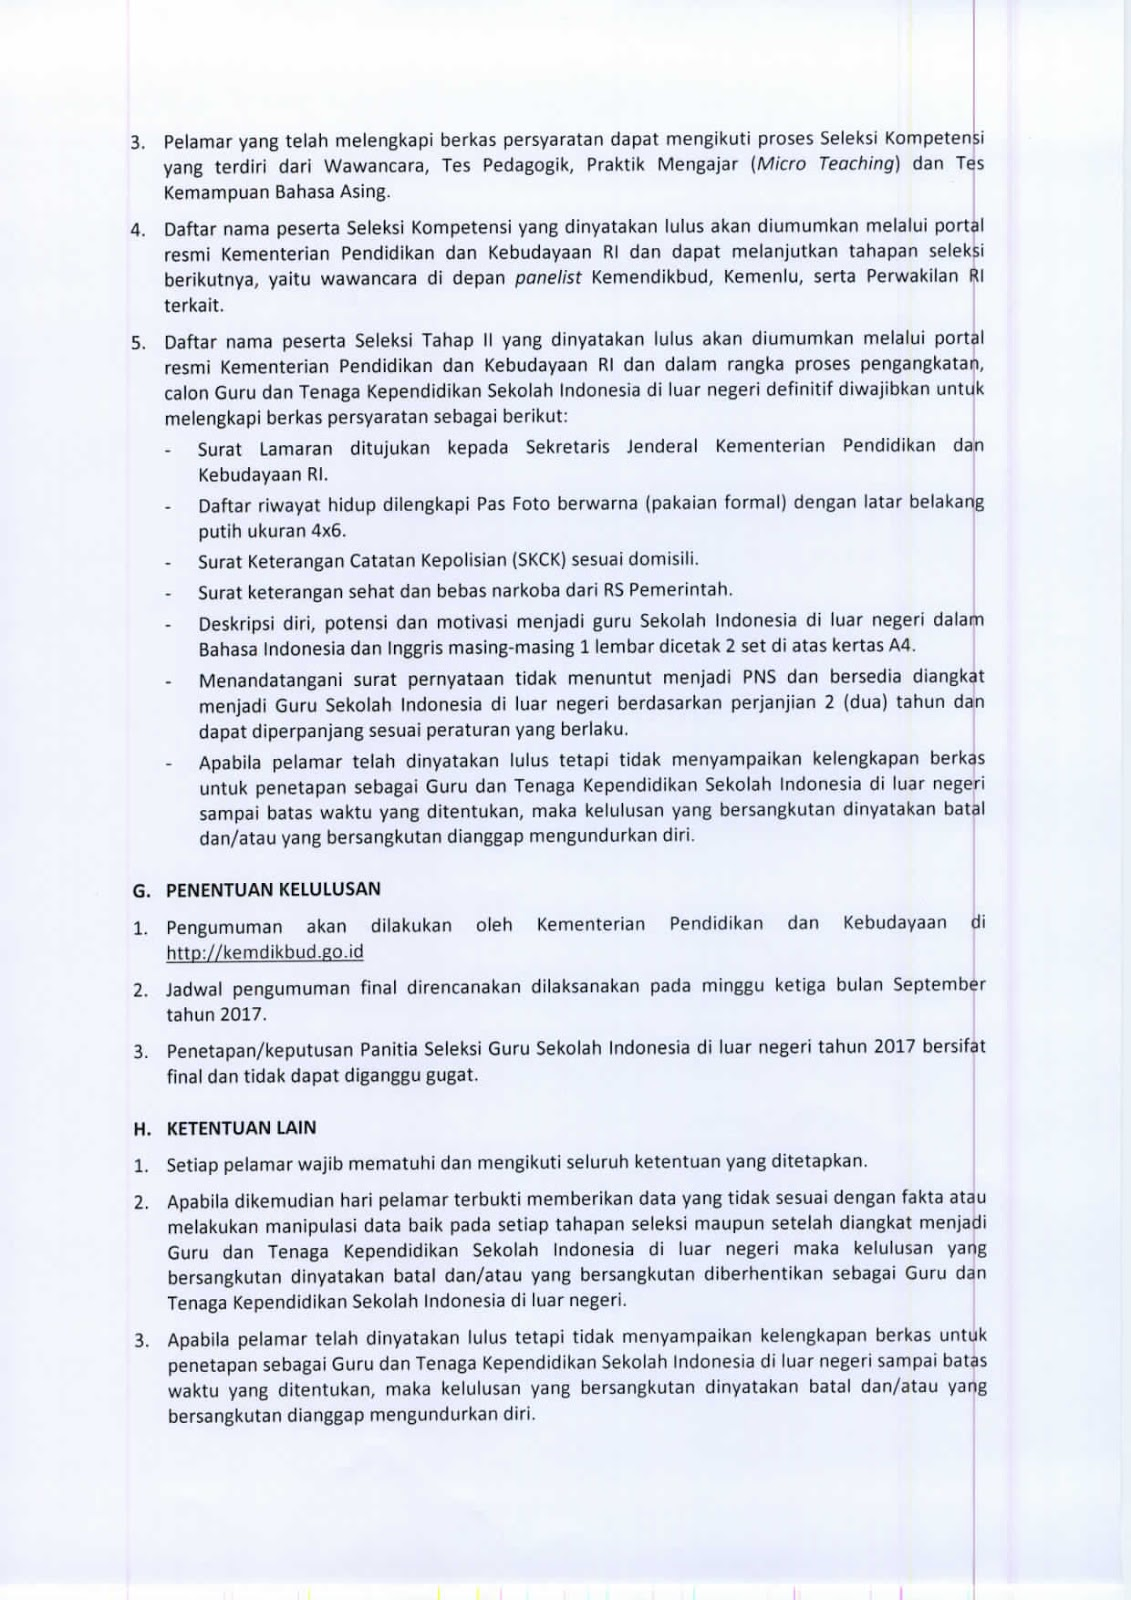 Pendaftaran Seleksi Gtk Non Pns Siln Sekolah Indonesia Luar Negeri 2017 Mkks Sma Smk